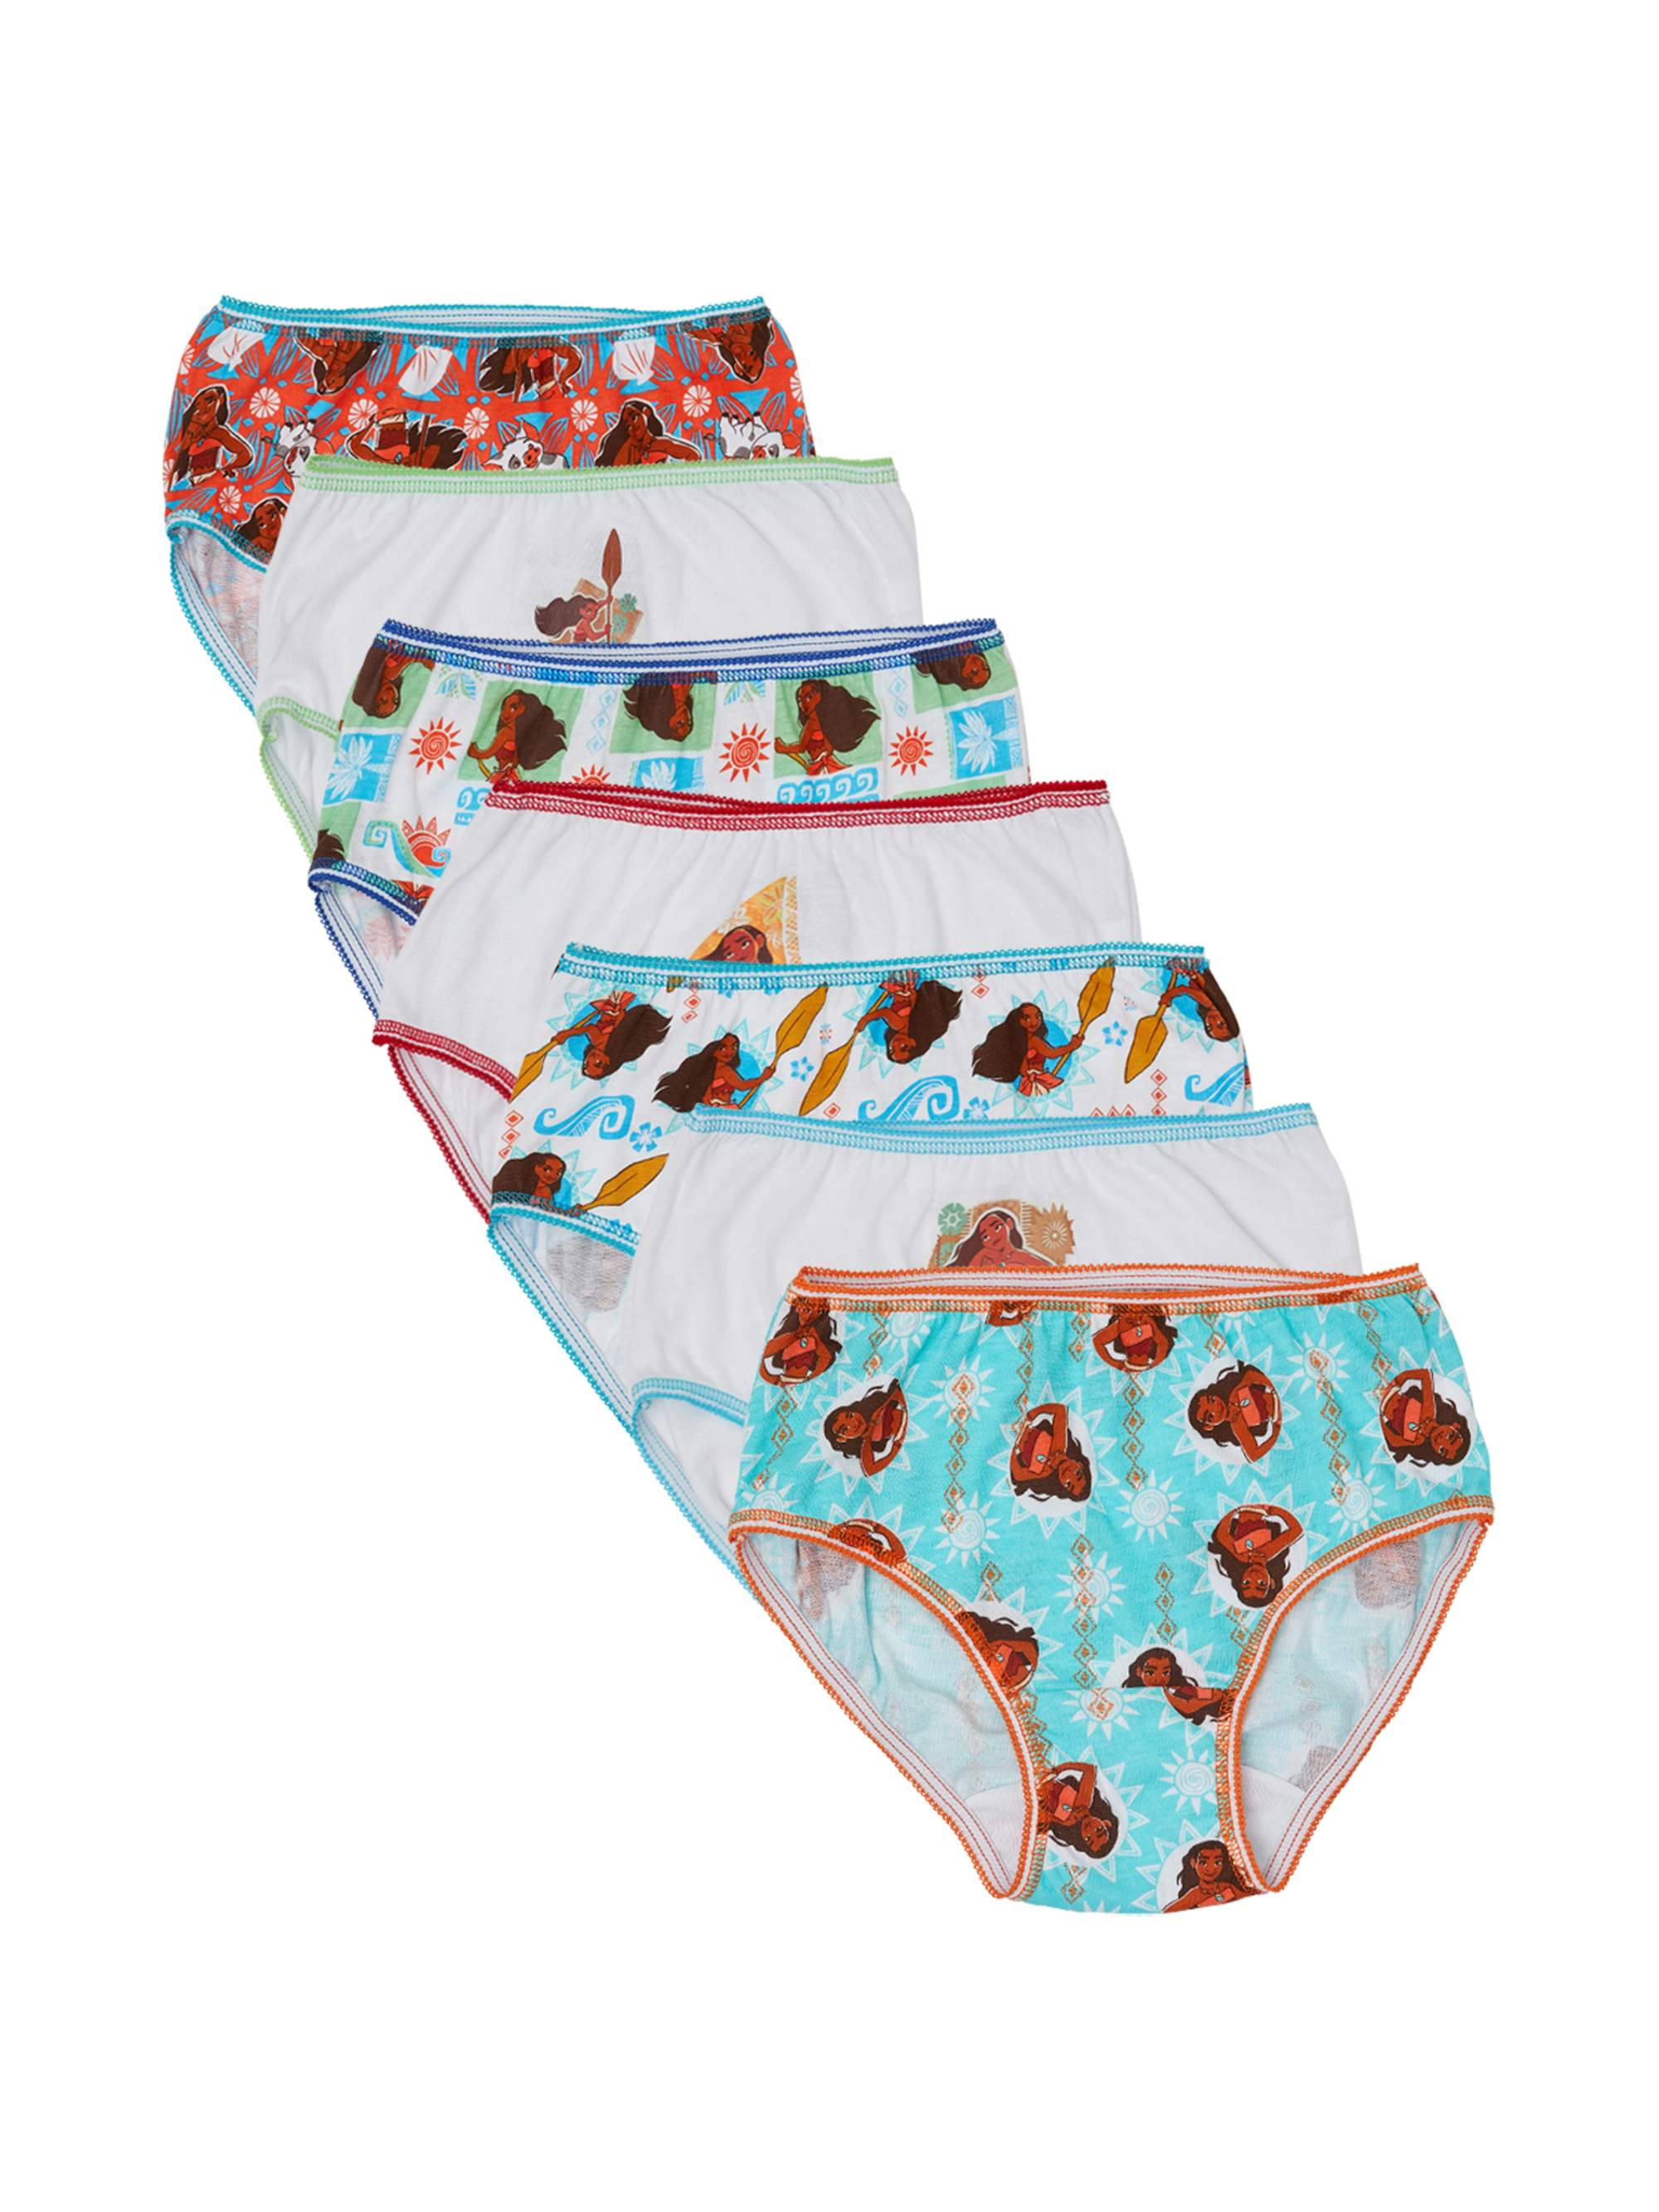 Moana Girls' Underwear, 7-Pack